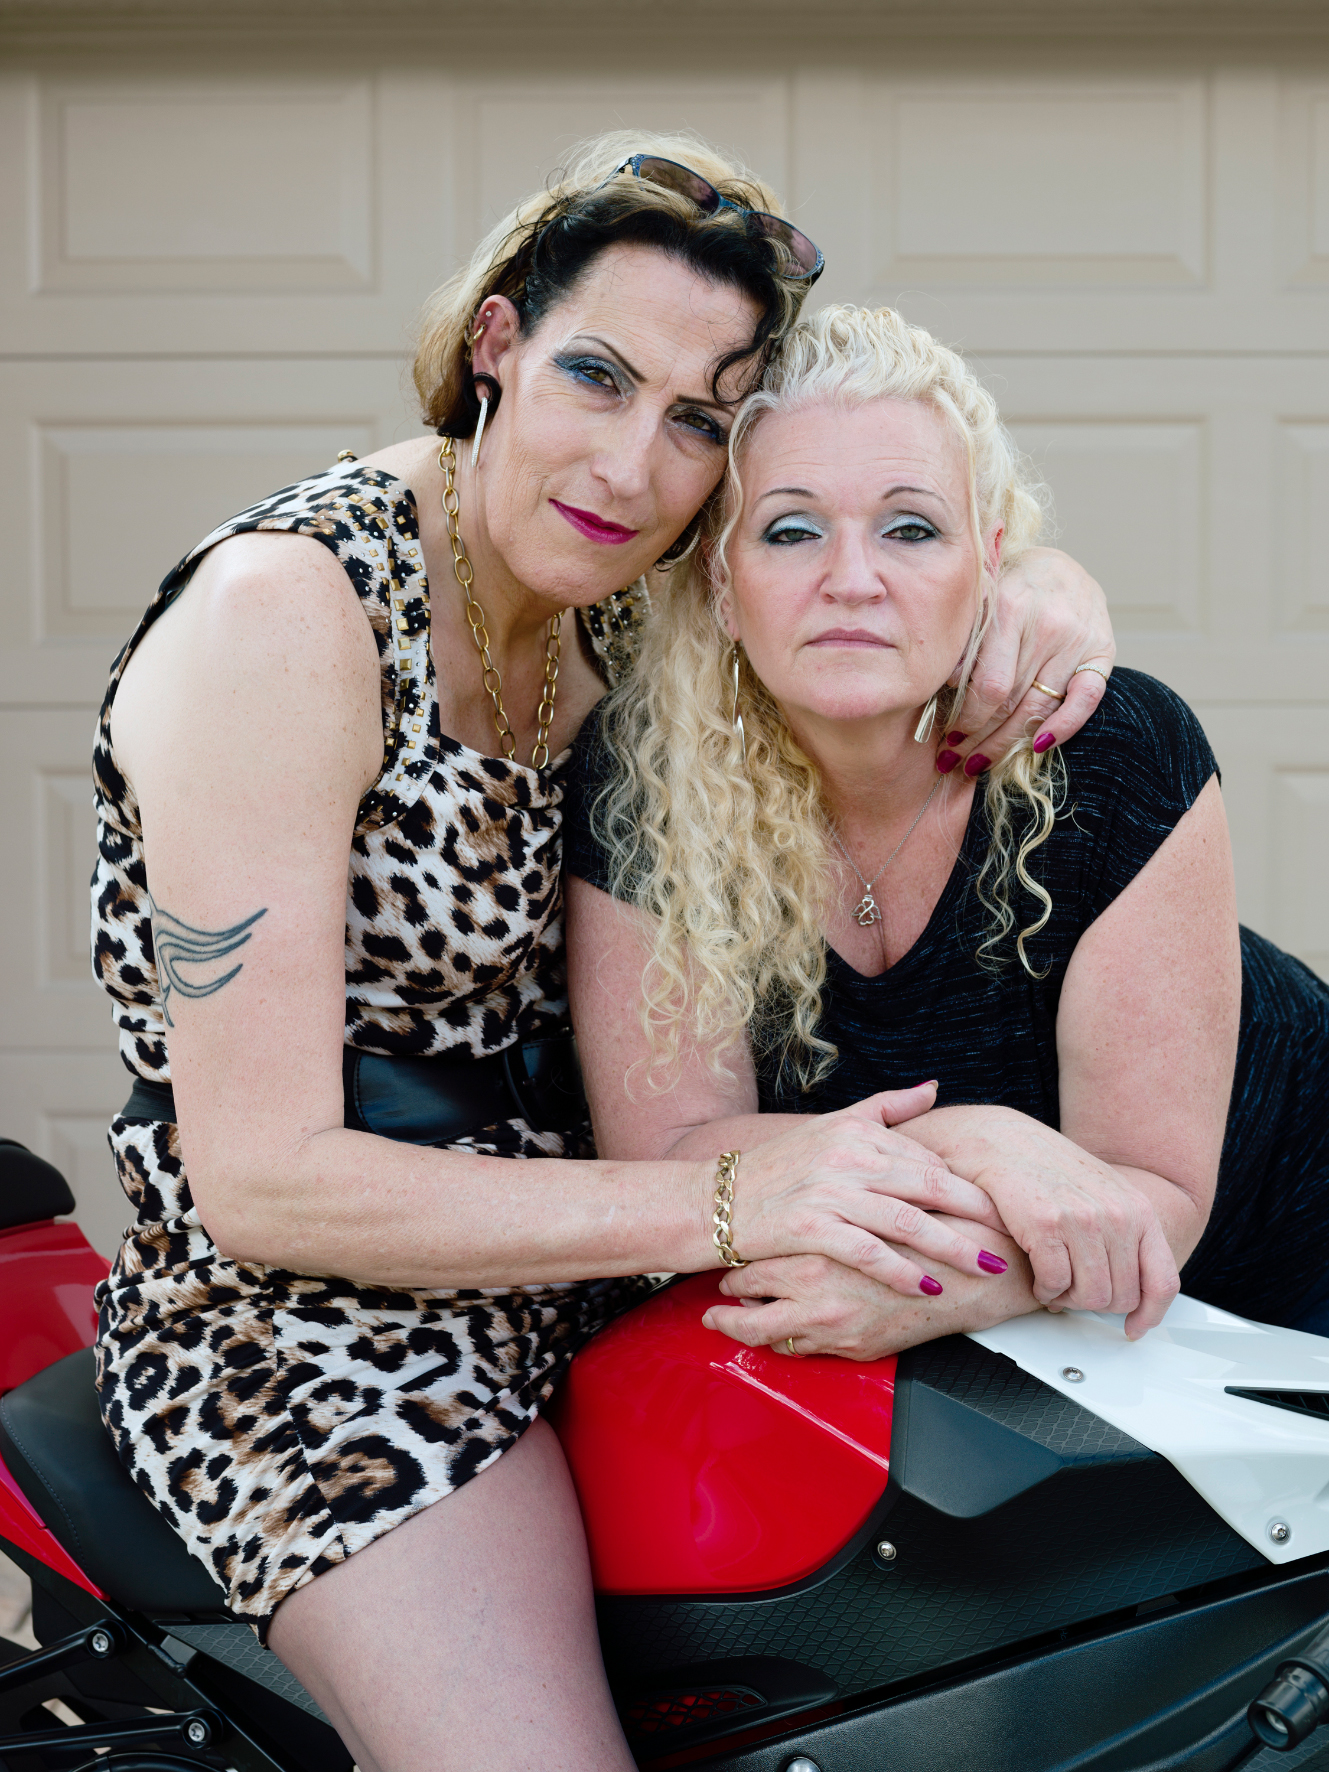 6_SueZie, 51, and Cheryl, 55, Valrico, FL, 2015 © Jess T. Dugan